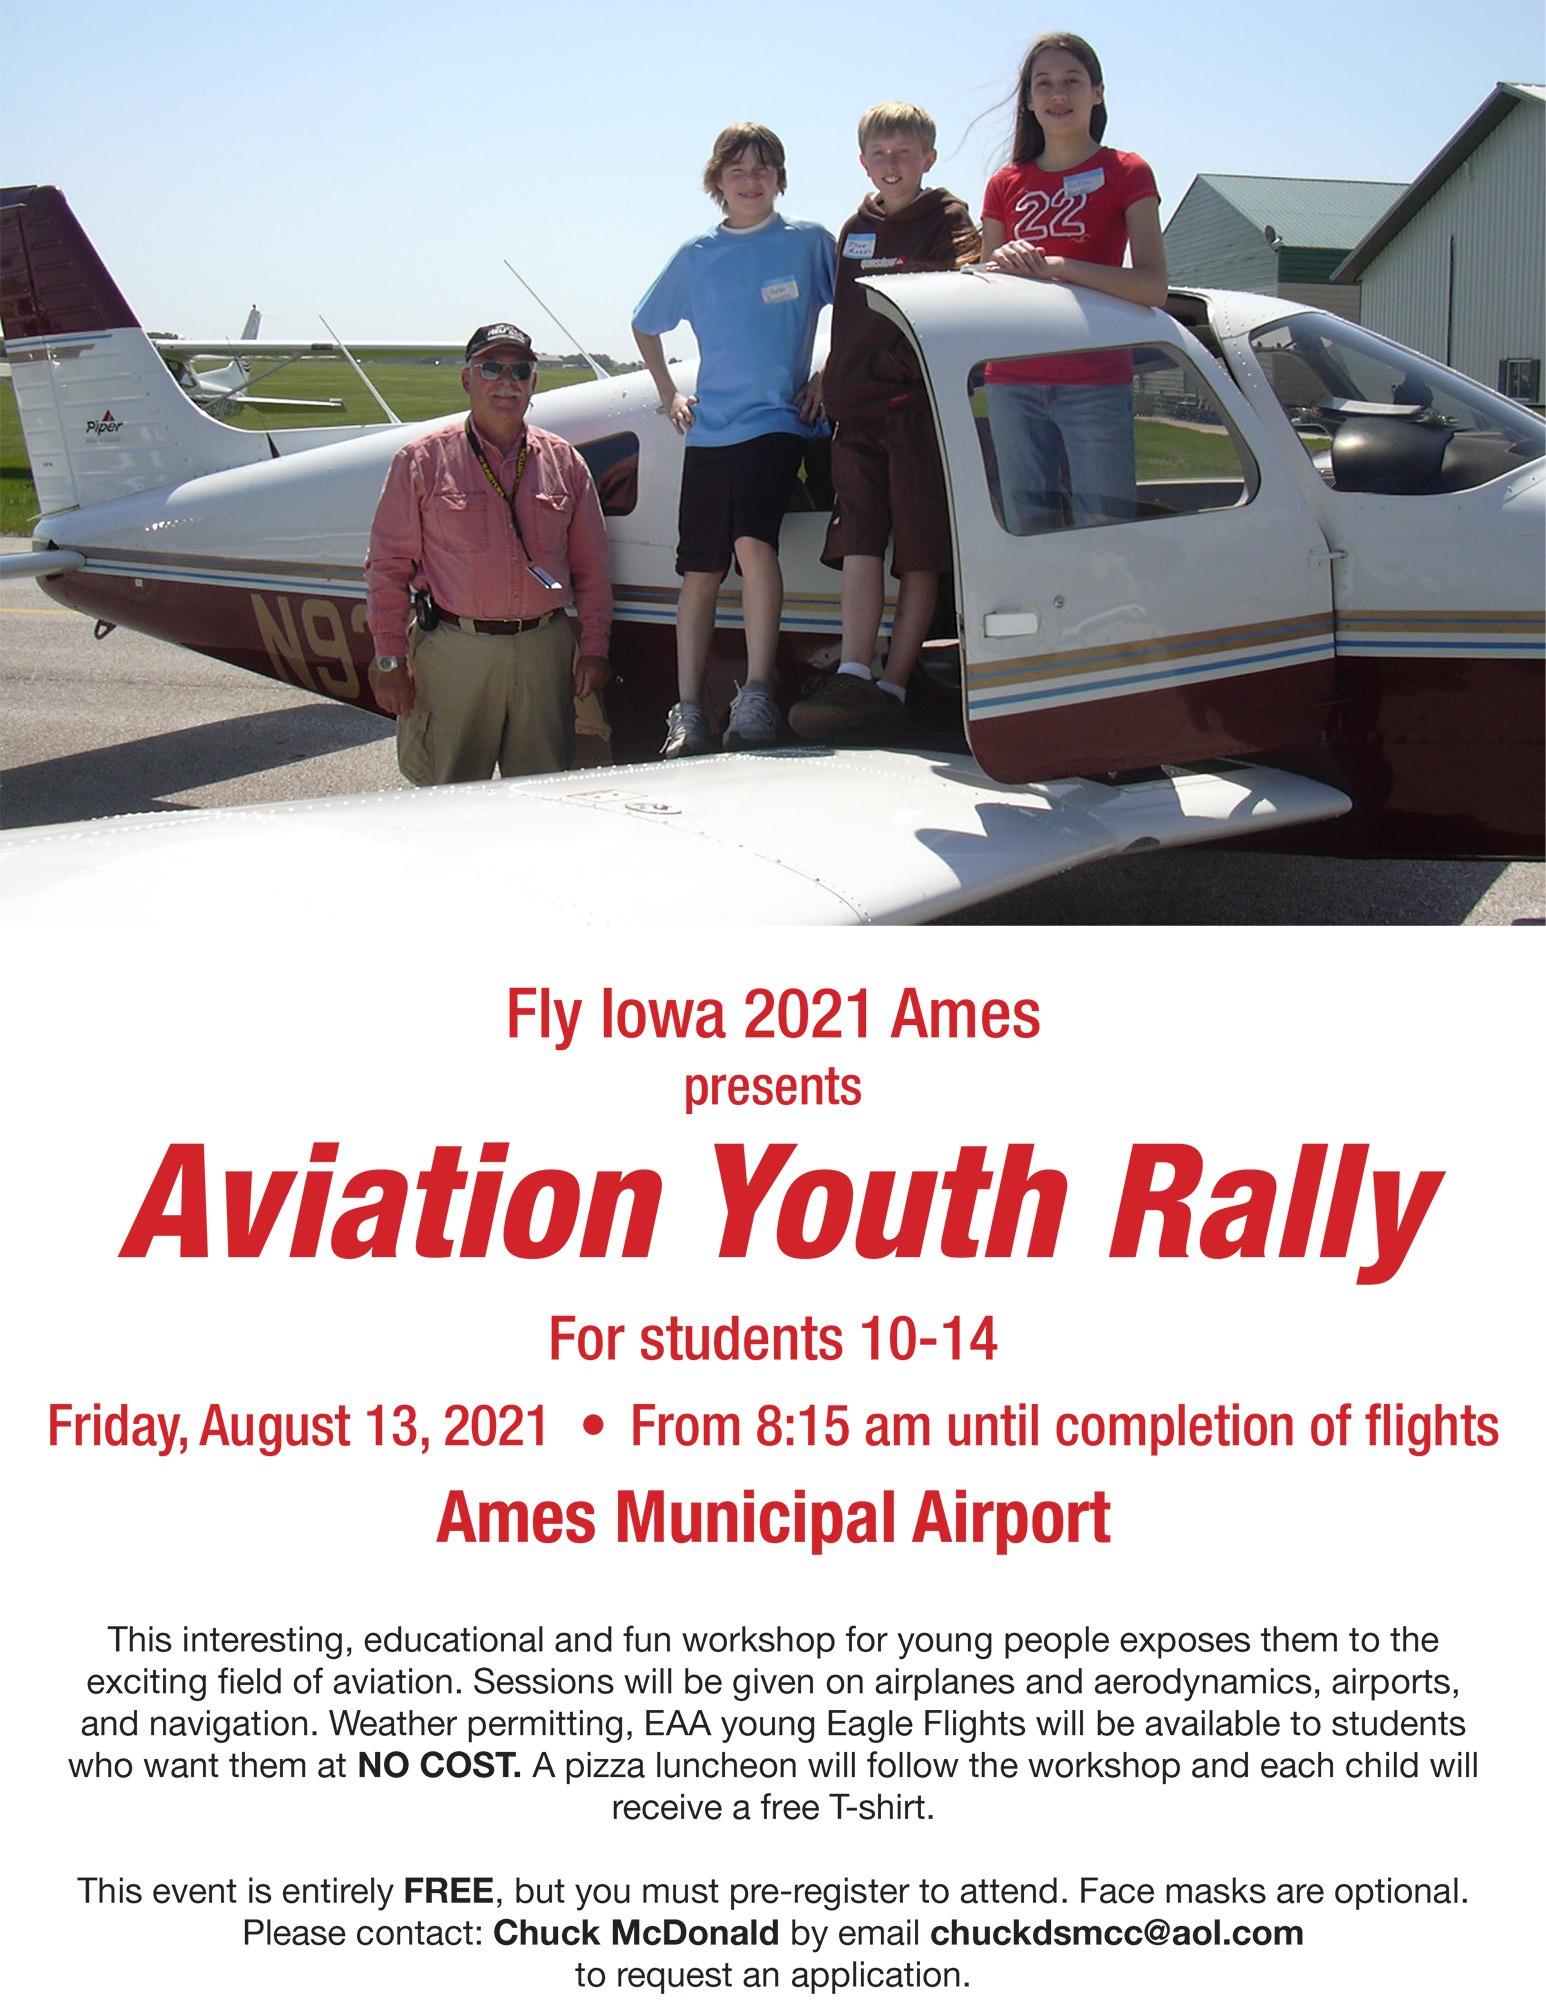 Youth Aviation Rally 2021